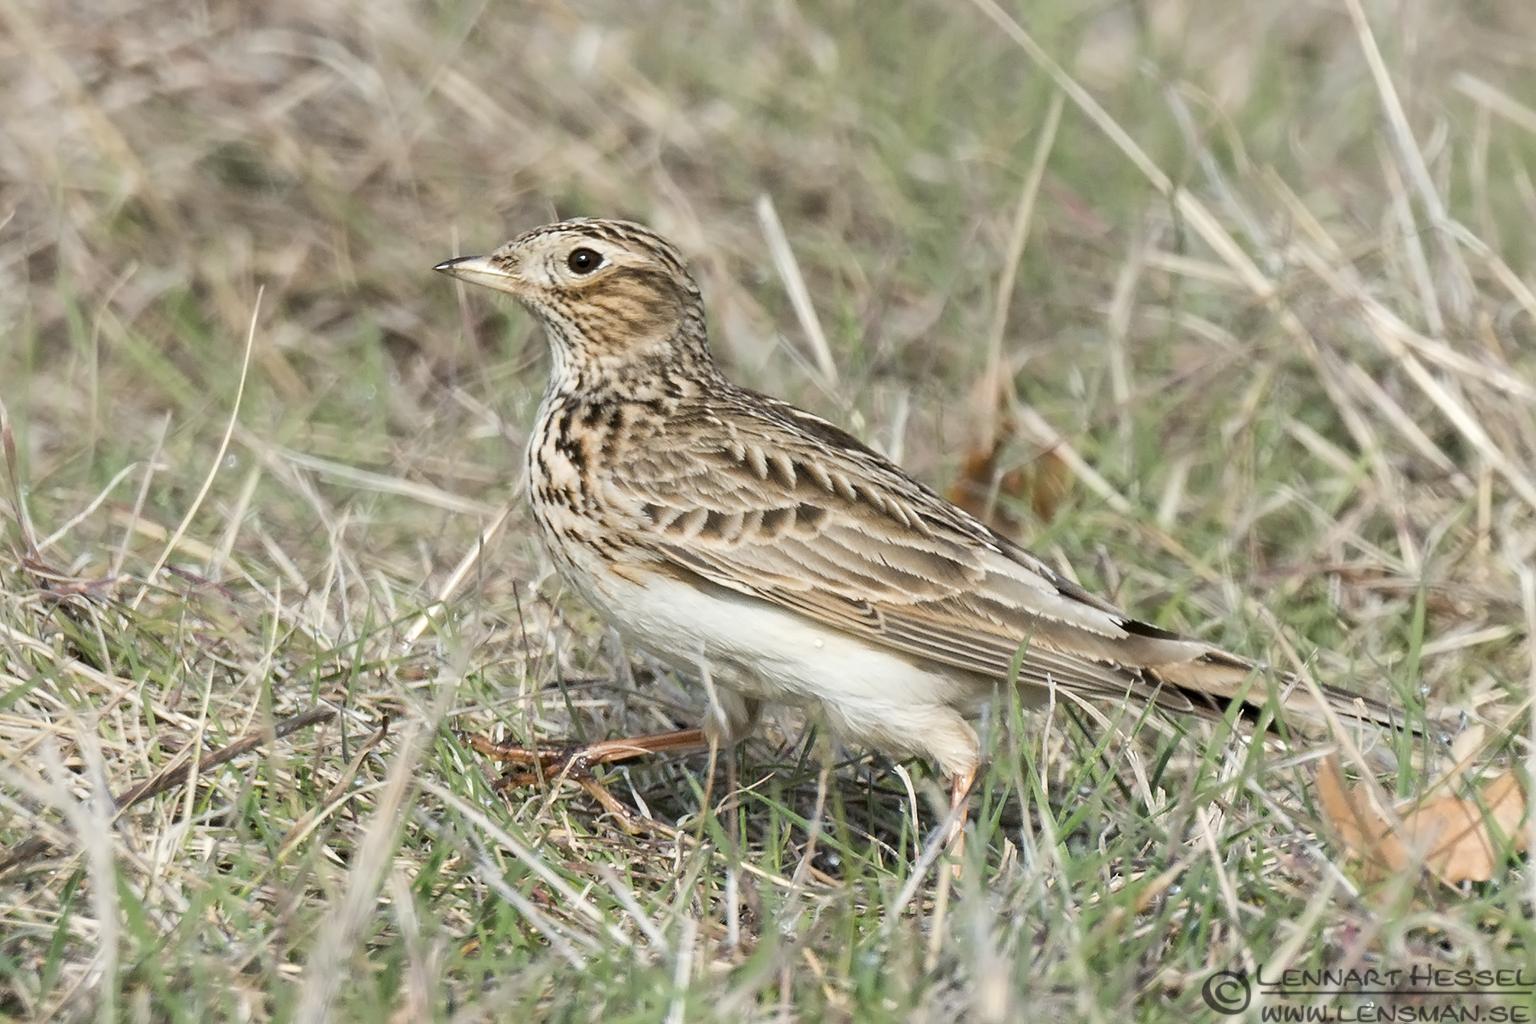 Woodlark Bulgaria